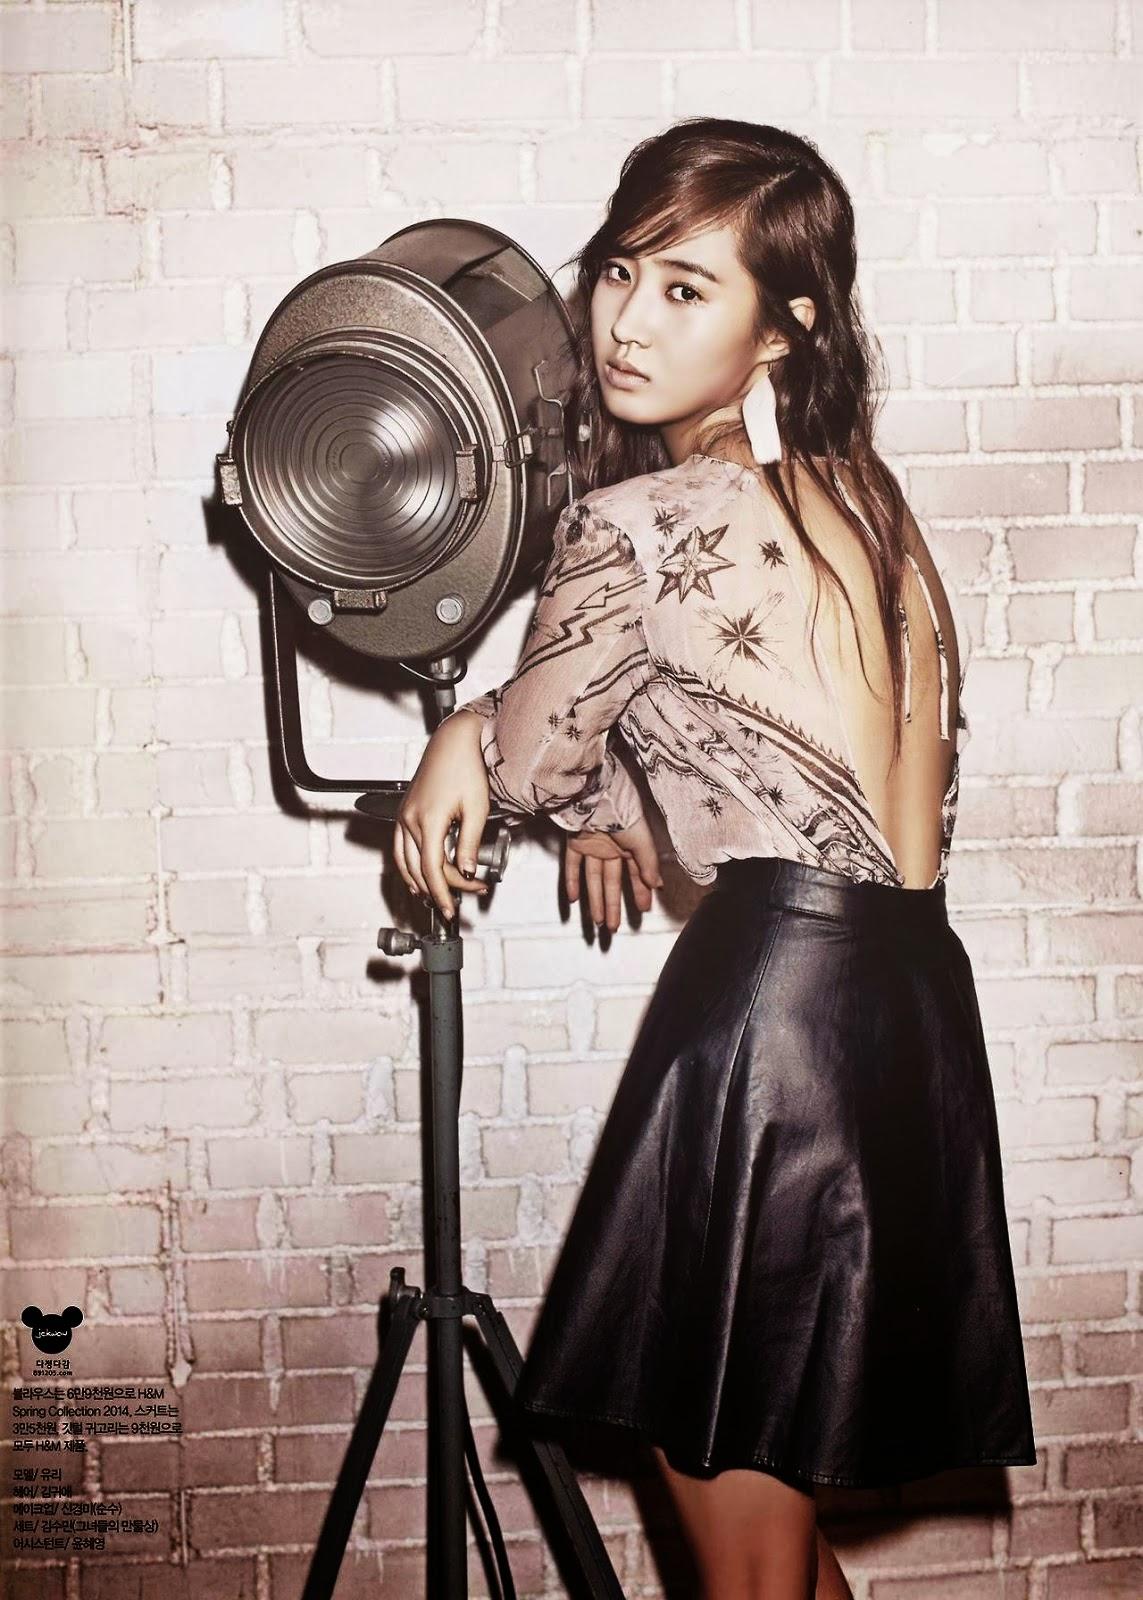 girls u0026 39  generation u0026 39 s yuri poses professionally for harper u0026 39 s bazaar